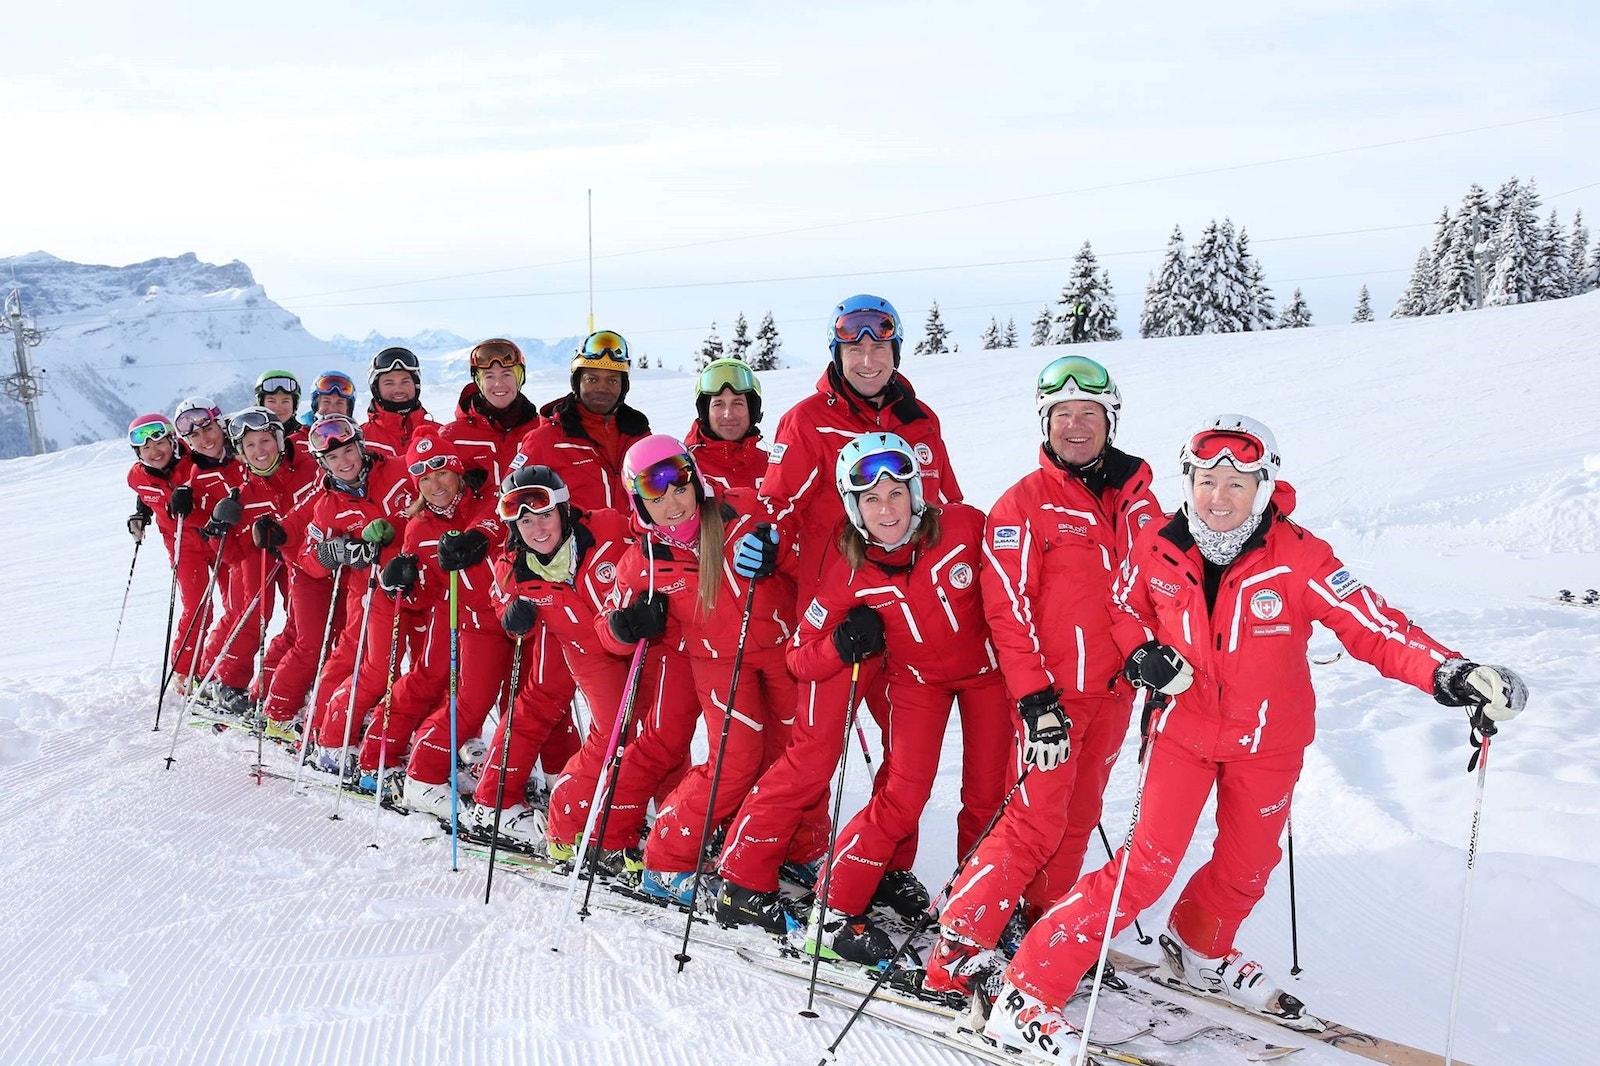 Ski Instructor Salaries - How much do ski Instructors earn? 2019